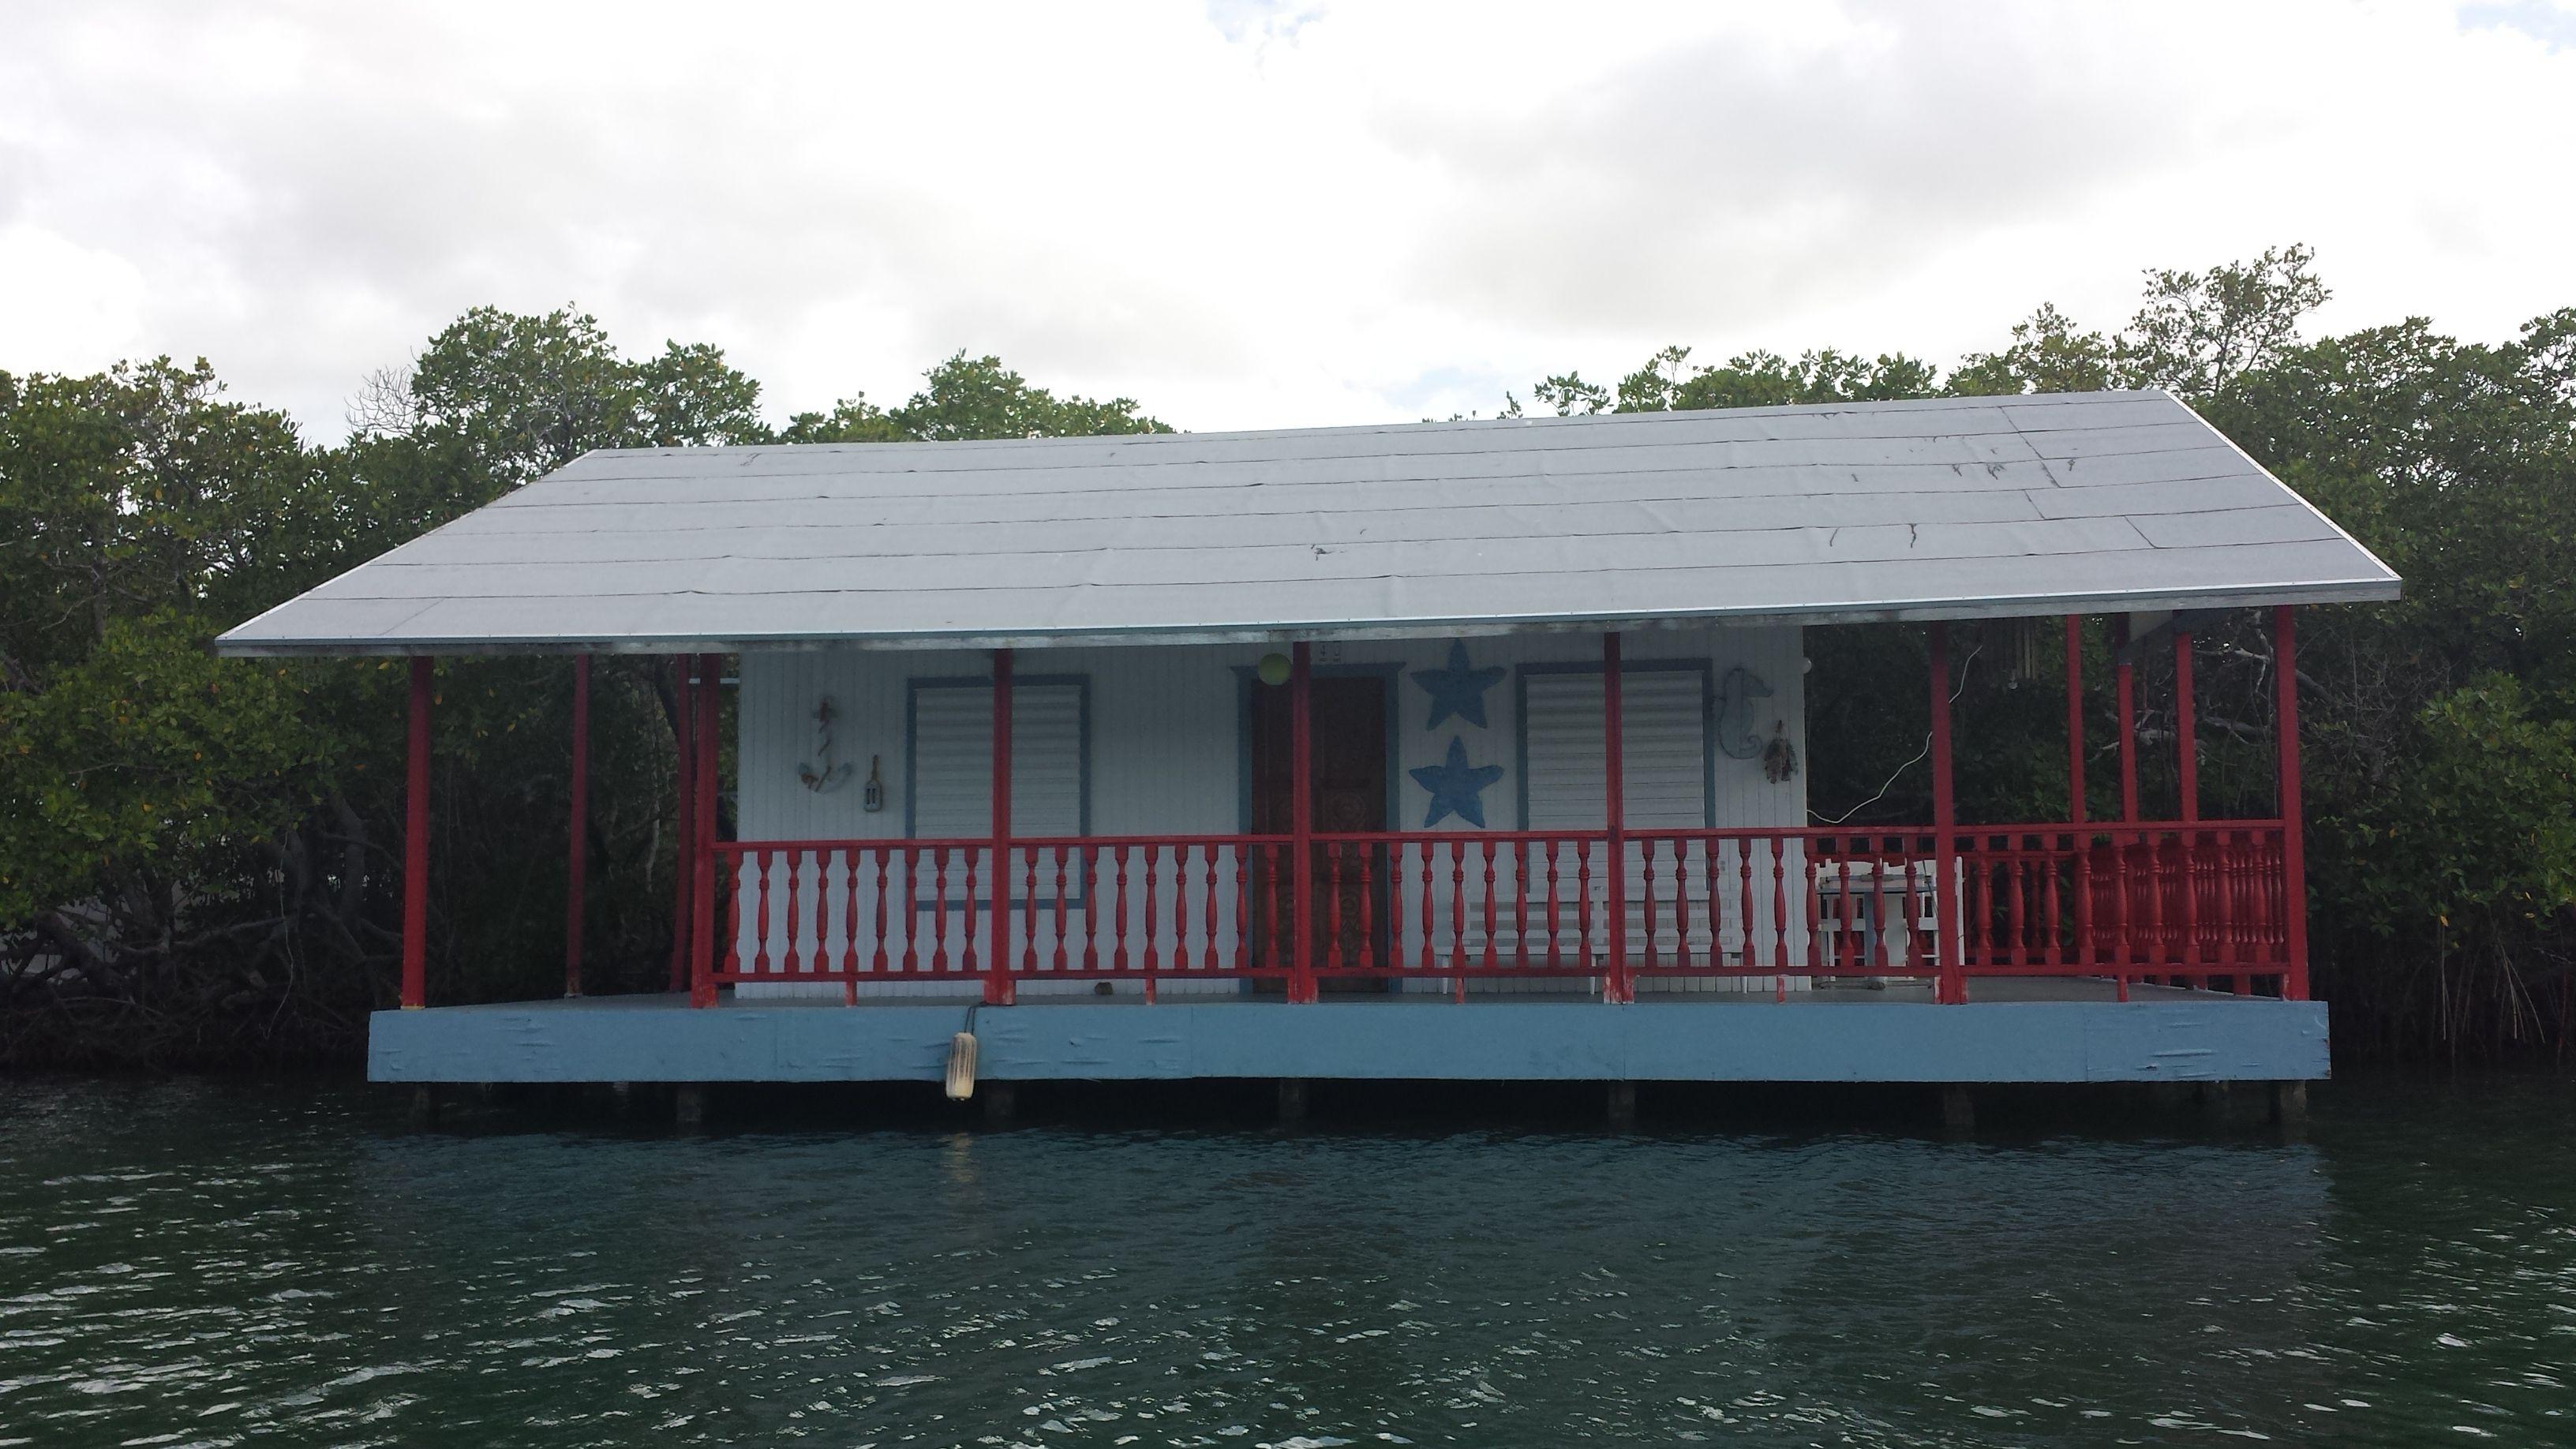 Casa azul montada en pilotes @ La Parguera